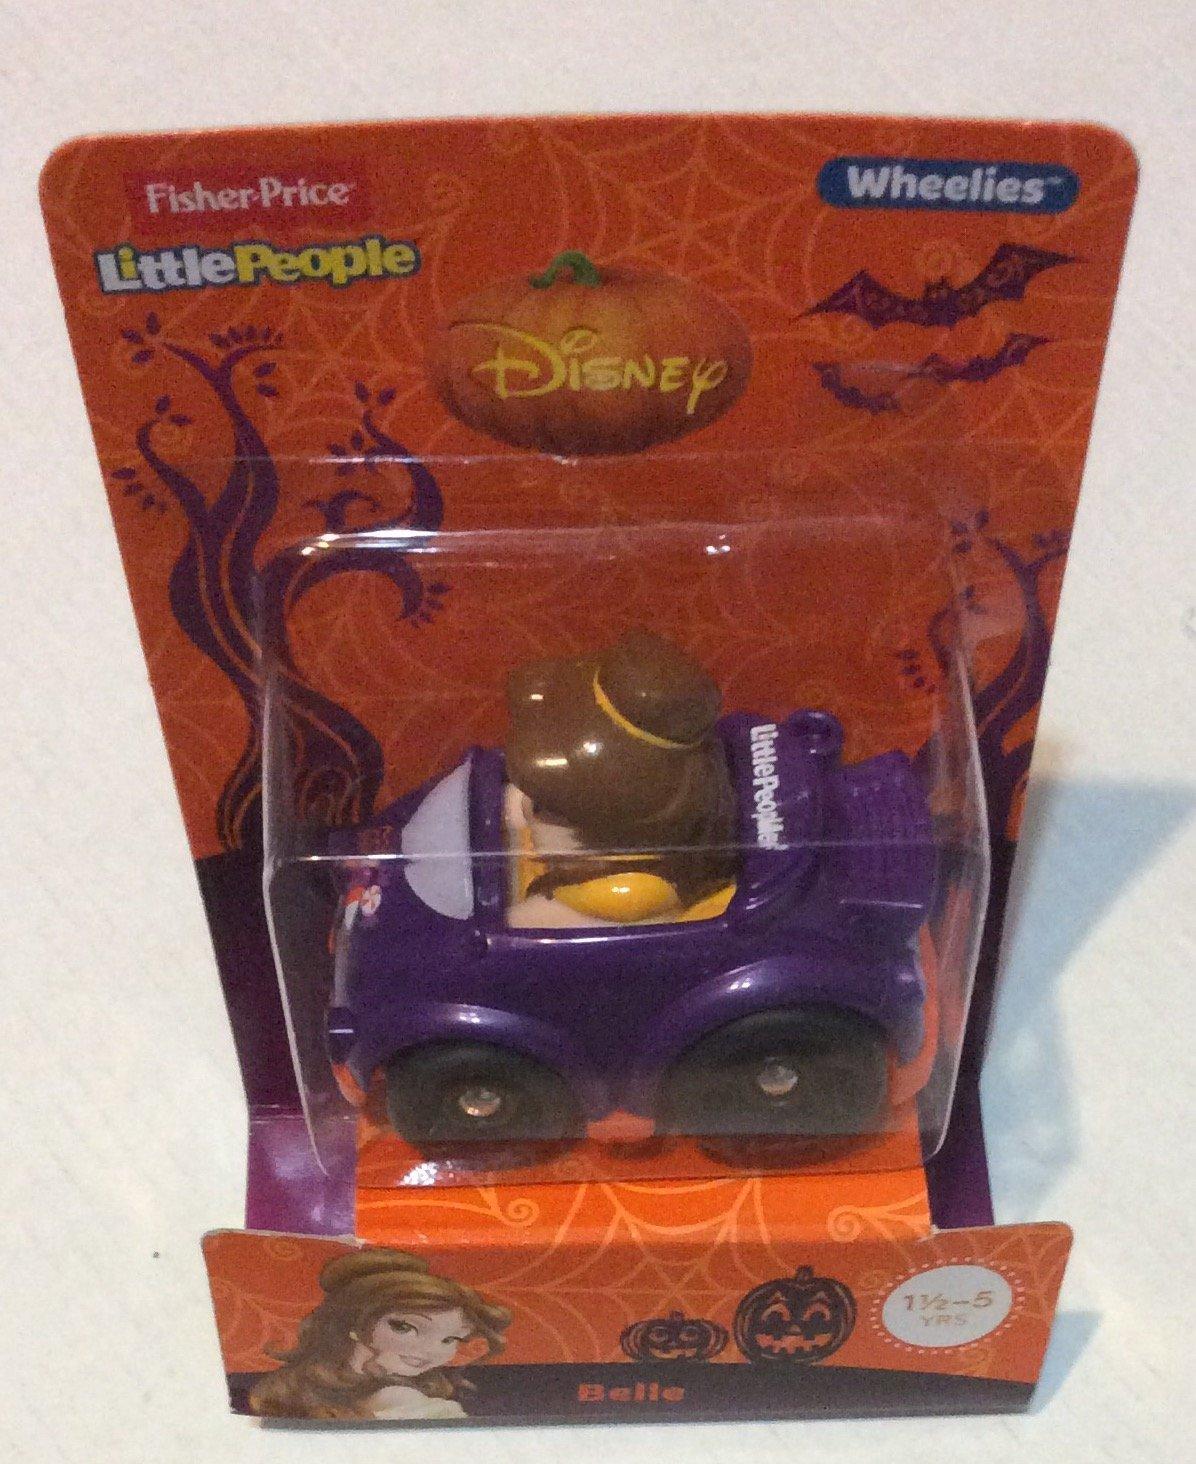 Fisher Price Little People Disney Wheelies  Belle  Halloween